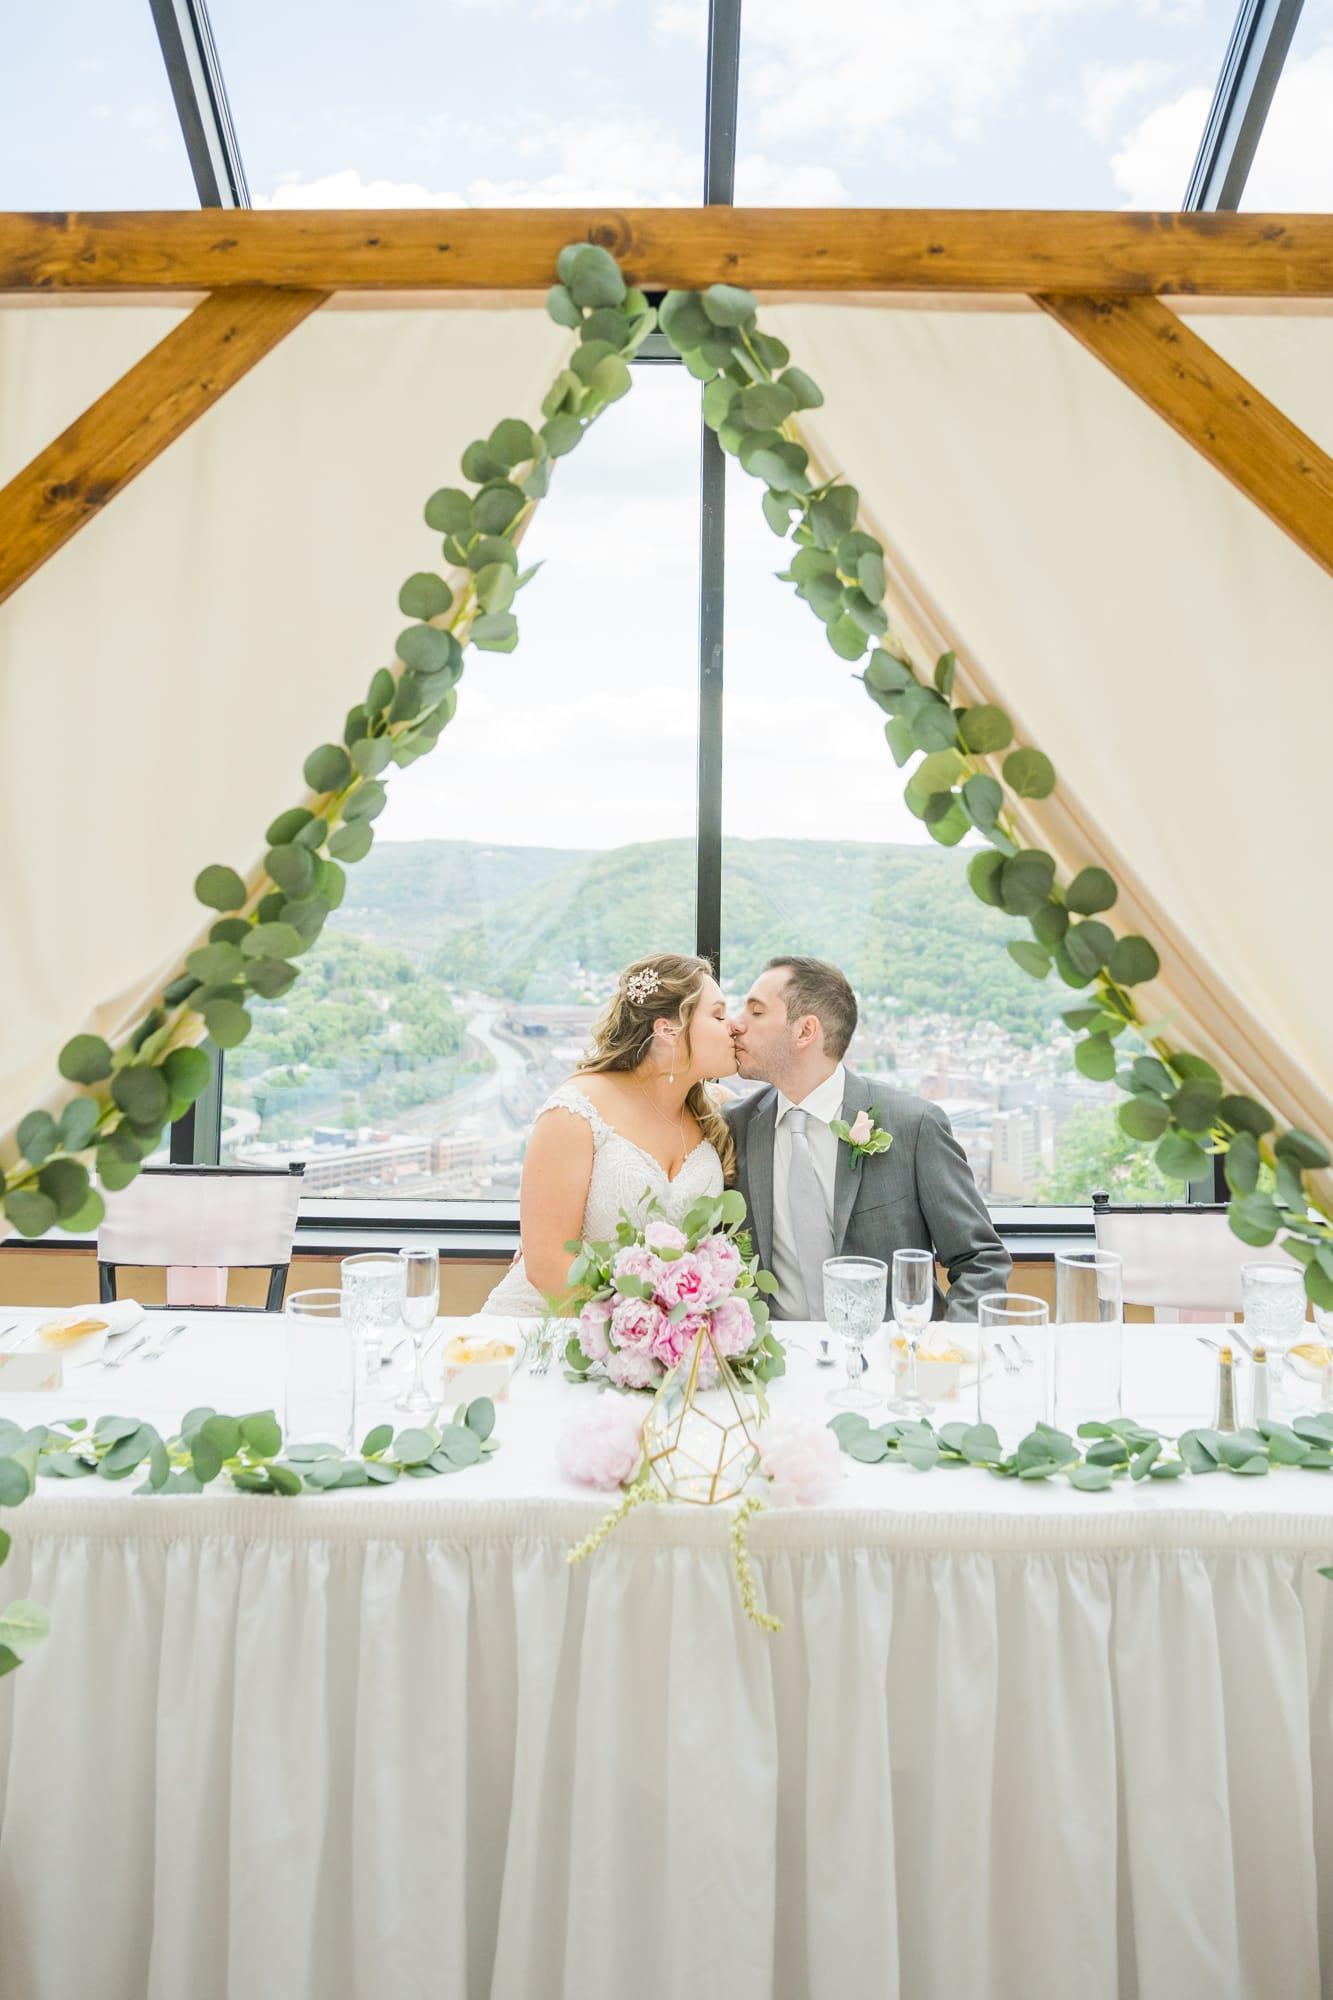 Central Pennsylvania PA summer wedding reception bride and groom kiss